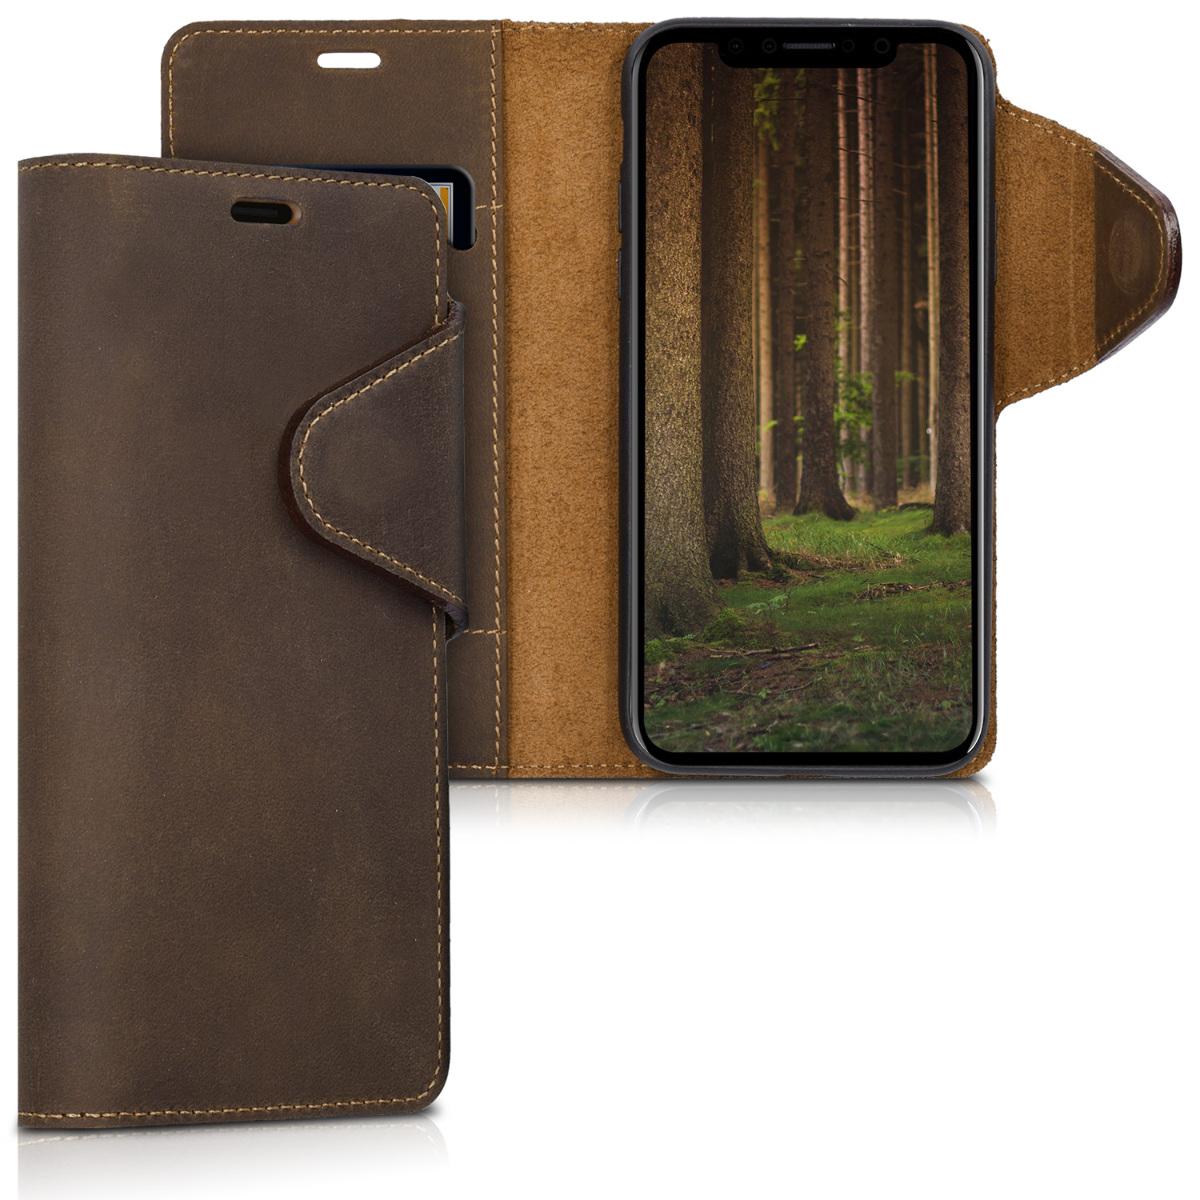 Kalibri Δερμάτινη Suede Θήκη - Πορτοφόλι iPhone X/XS -  Brown (42515.05)